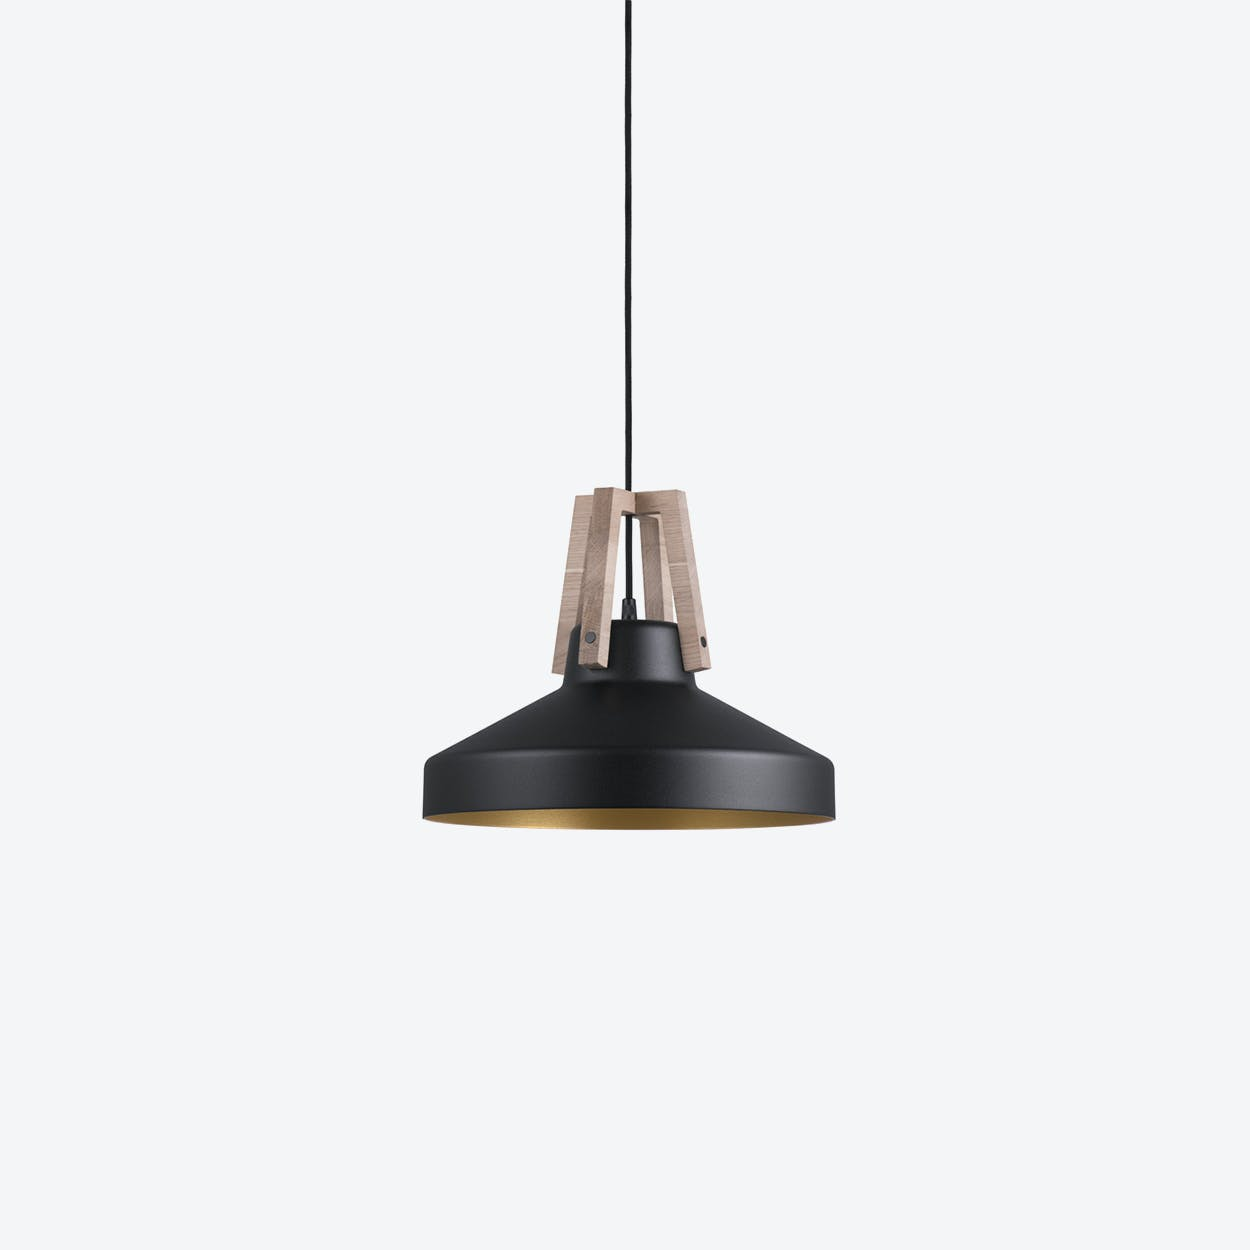 Work Pendant Lamp in Black/Gold